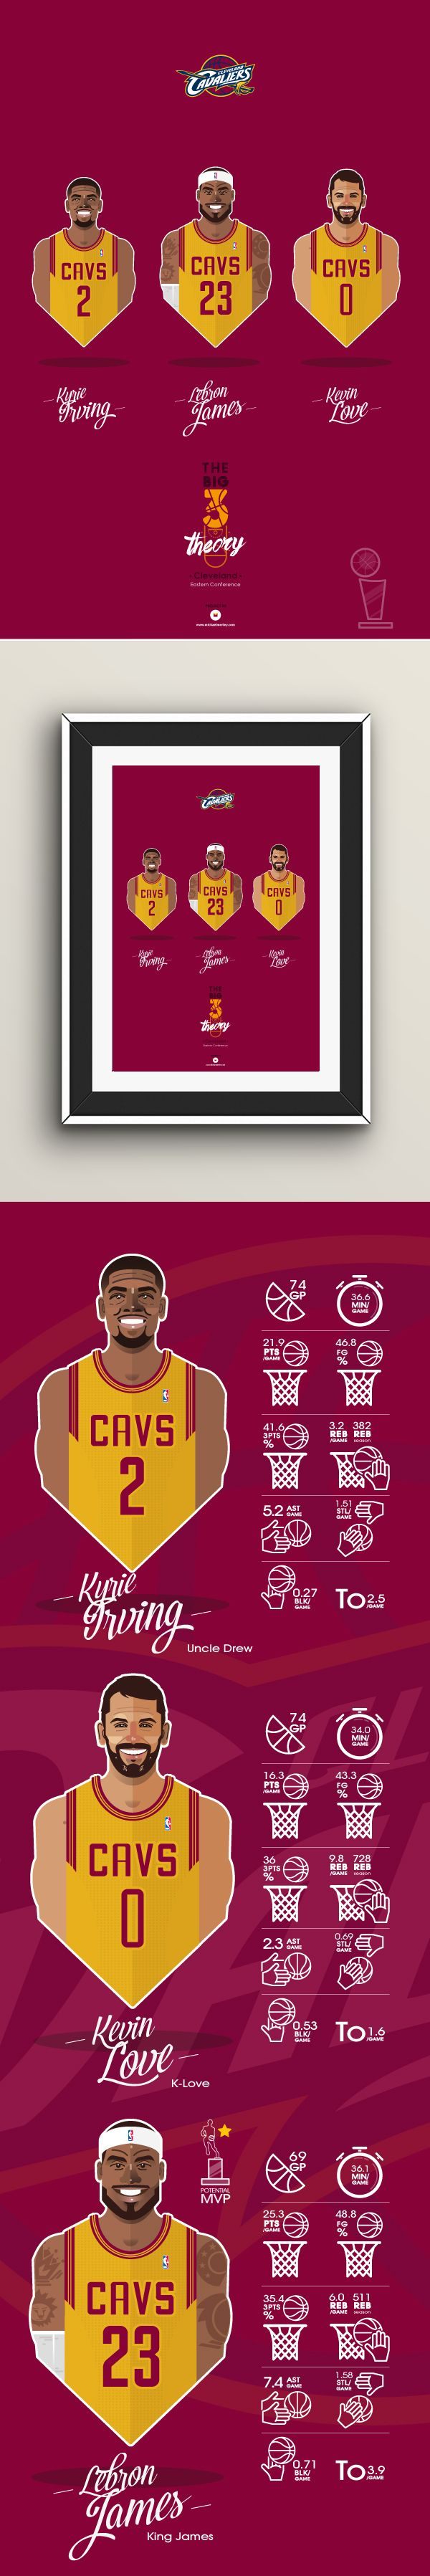 #NBA #players #CAVS #Cavaliers #Cleveland #vector face Big Men Big 3 #playoffs sport basketball illustration #Lebron #irving #Love